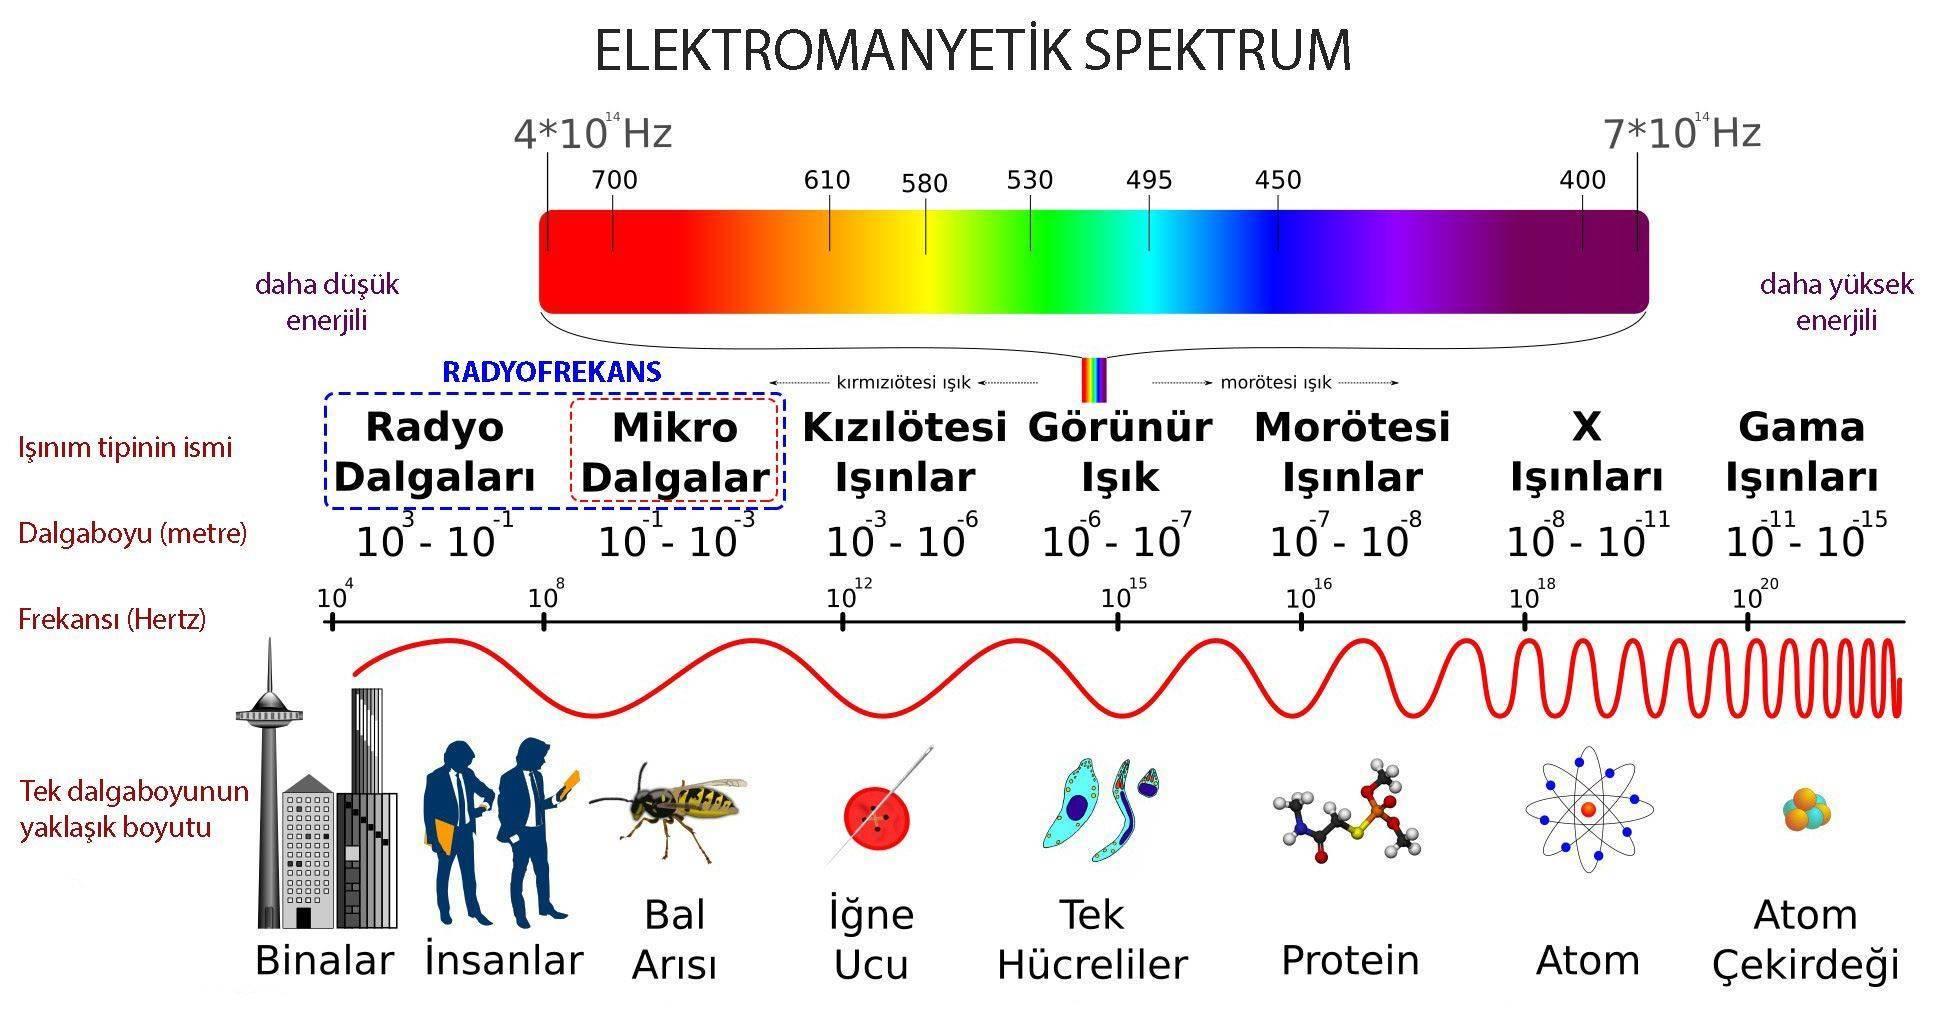 elektromanyetik spektrum radyofrekans dalga boyu mikrodalga